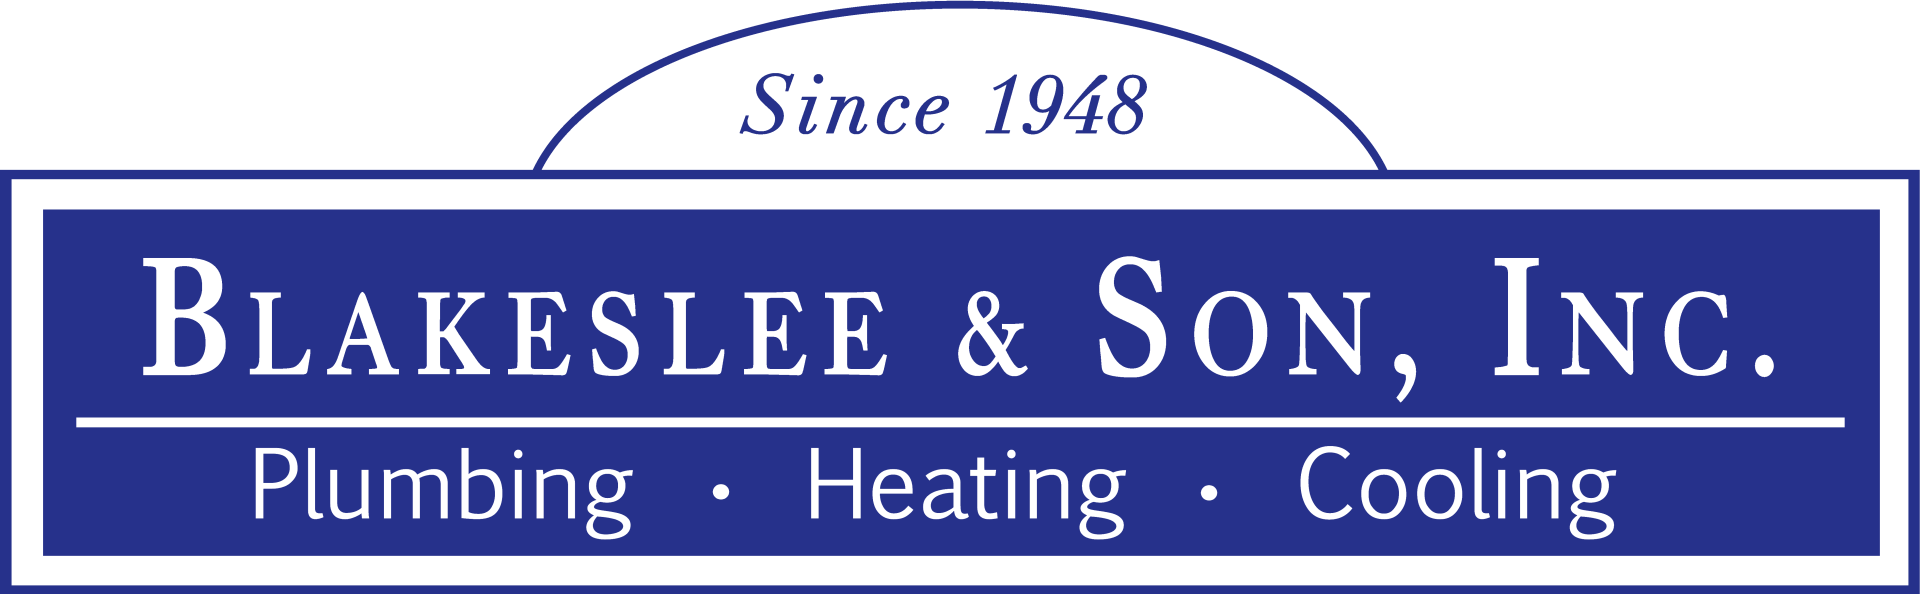 Blakeslee & Son, Inc. - Logo